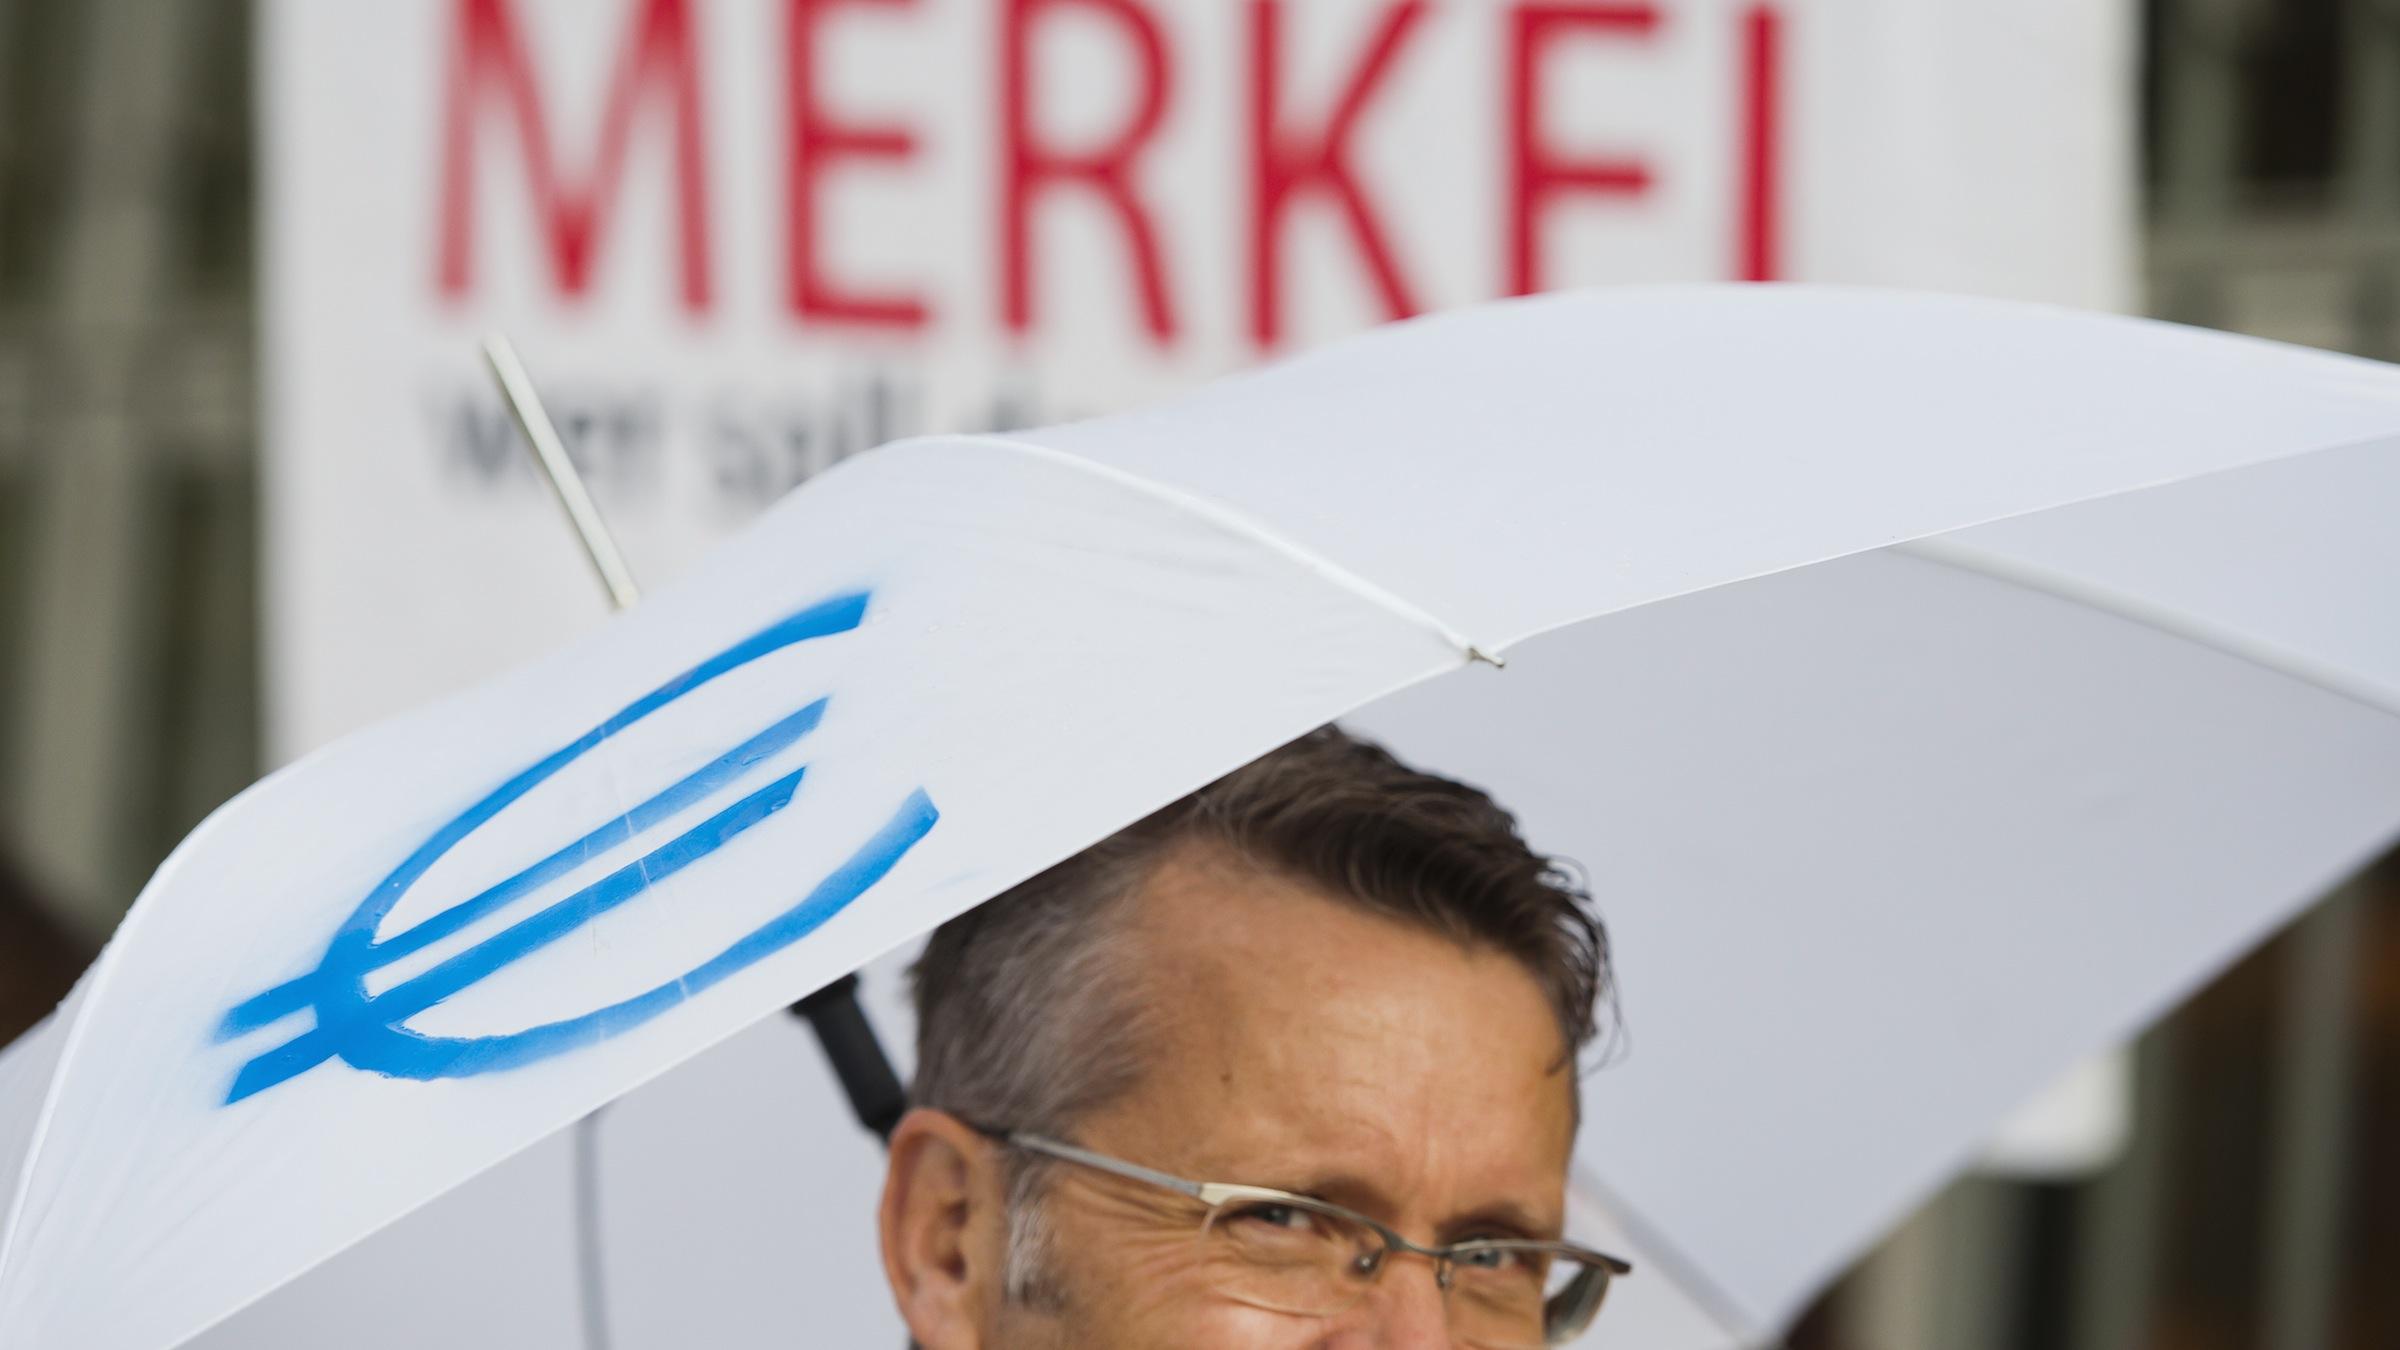 Euro umbrella